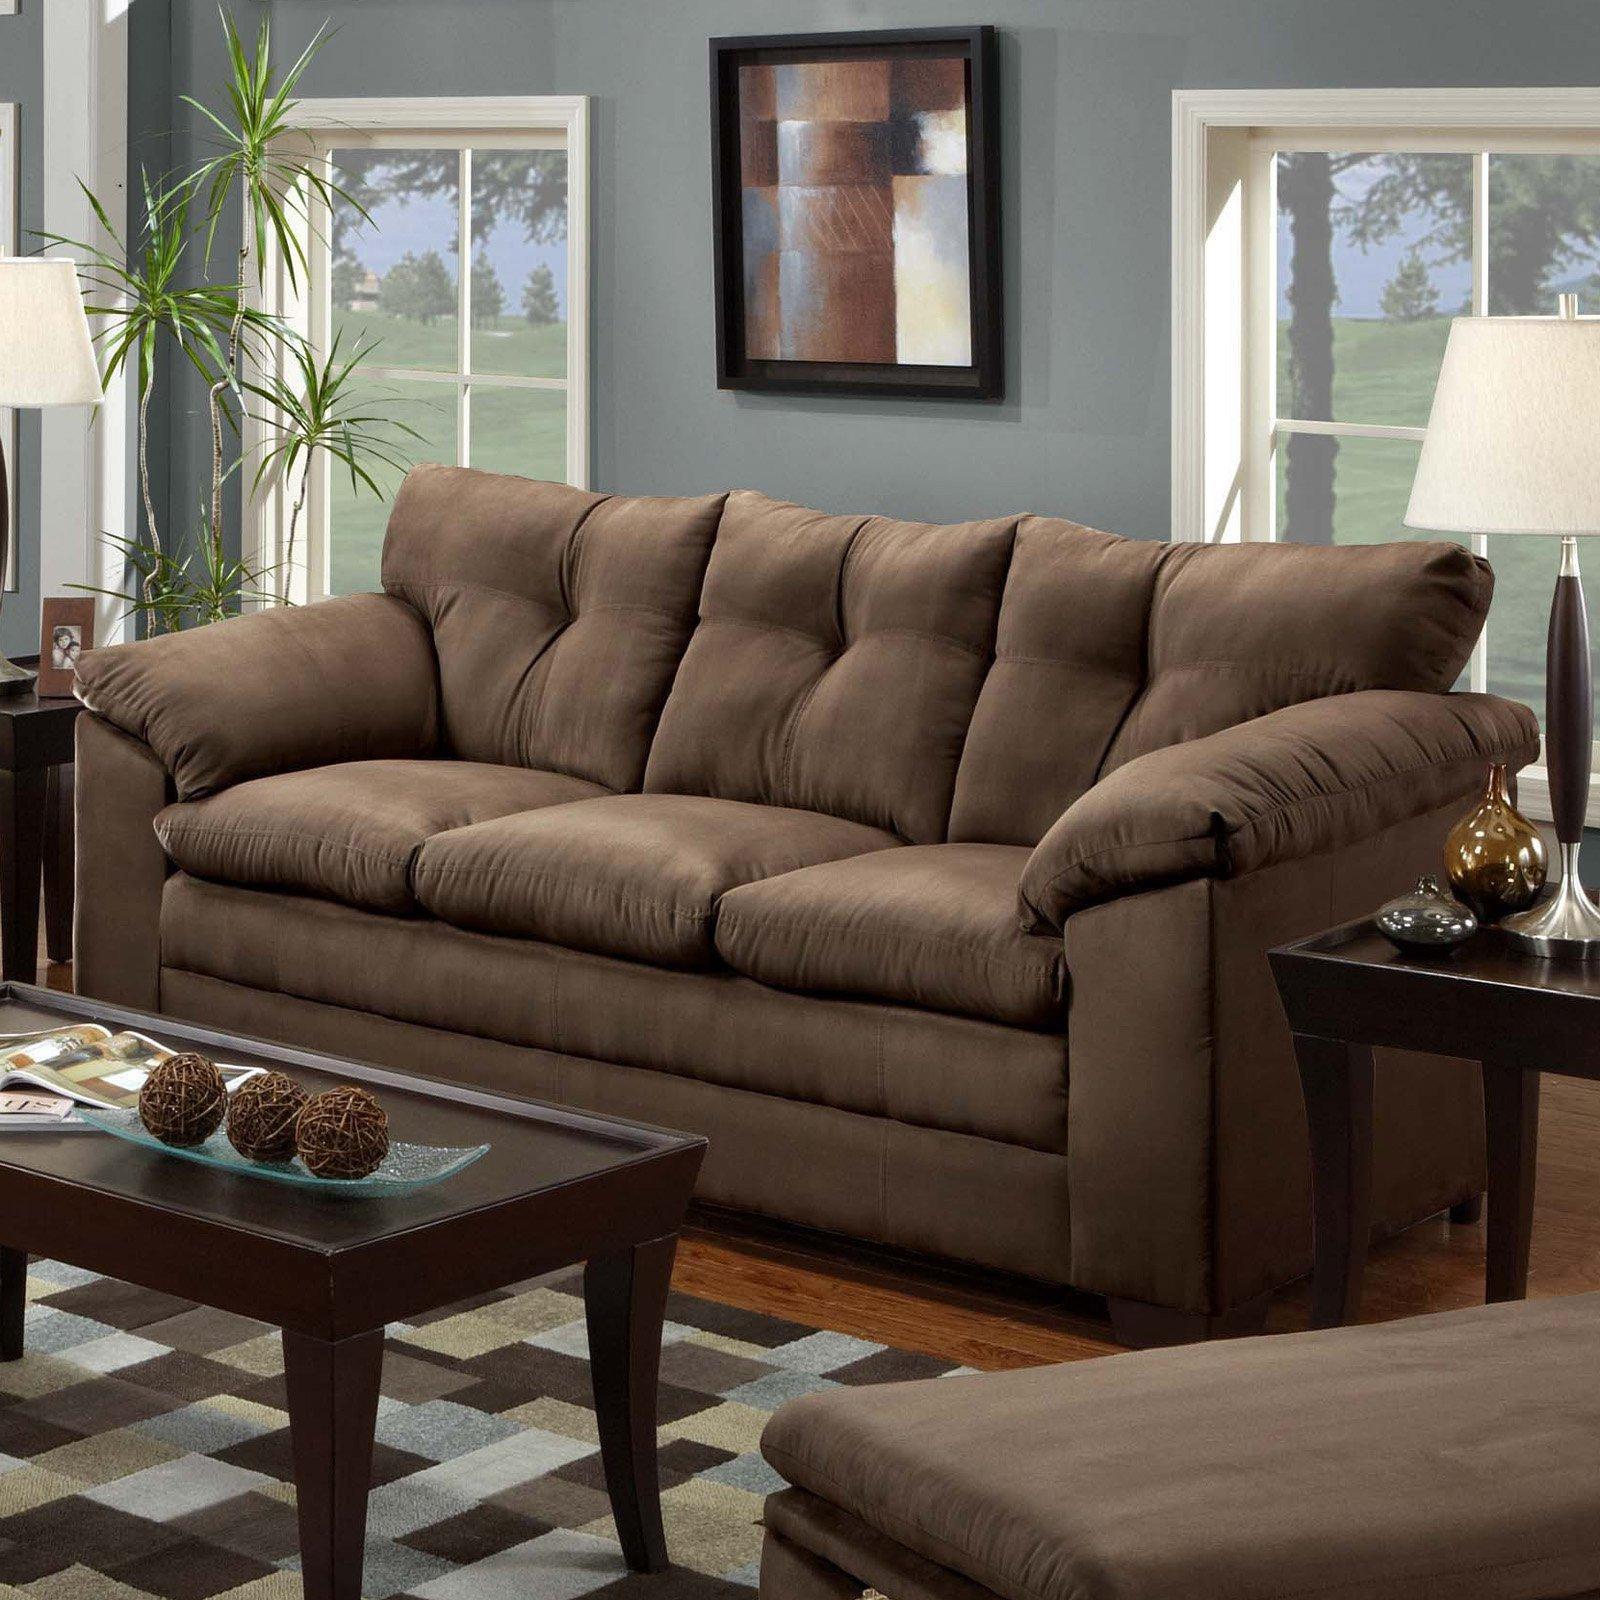 Simmons Luna Chocolate Microfiber Sofa – Walmart Pertaining To Simmons Microfiber Sofas (View 10 of 20)